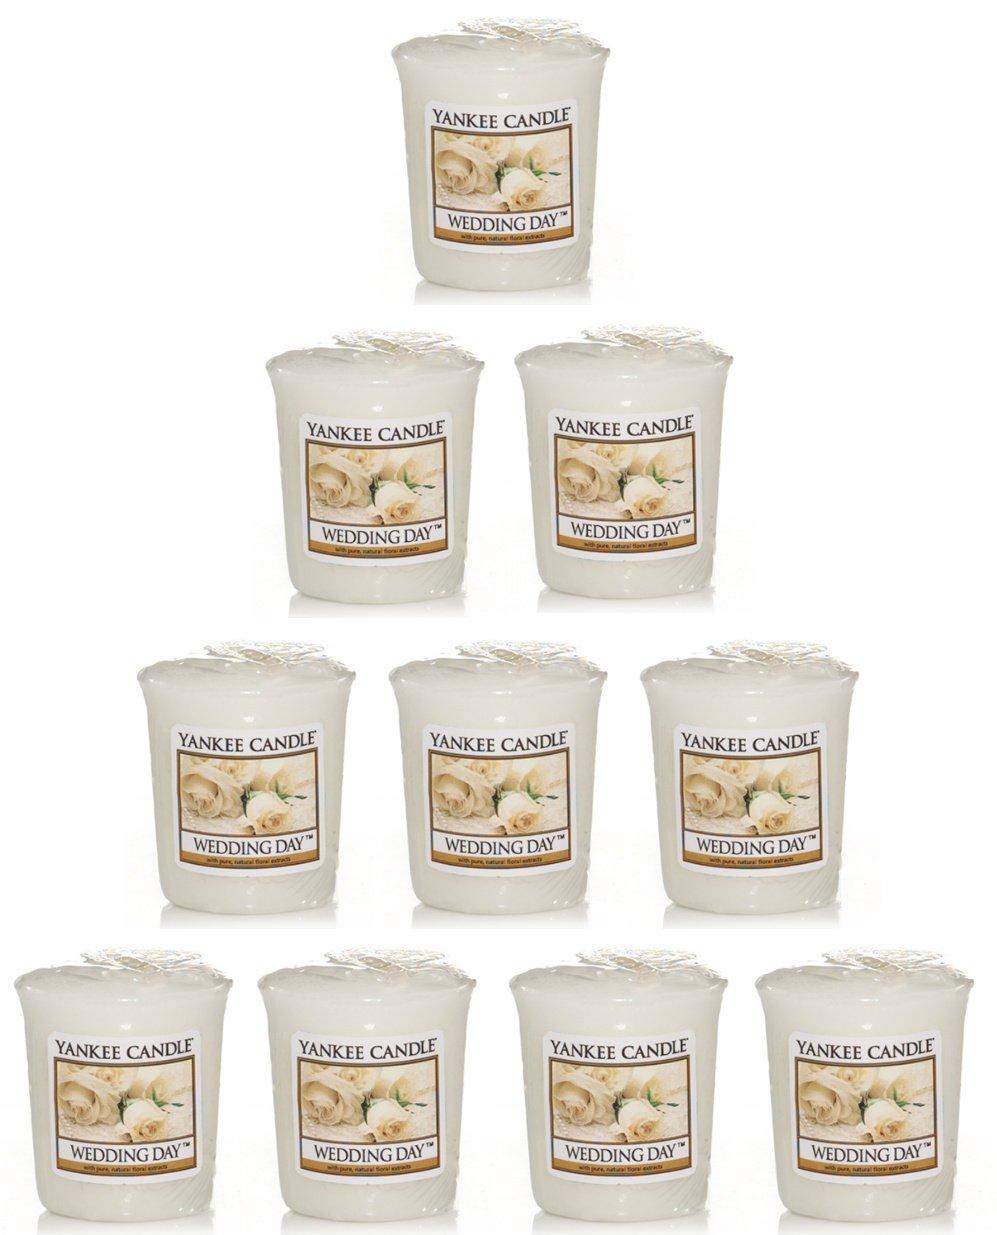 Yankee Candle - 10 Wedding Day Votive Samplers: Amazon.co.uk ...